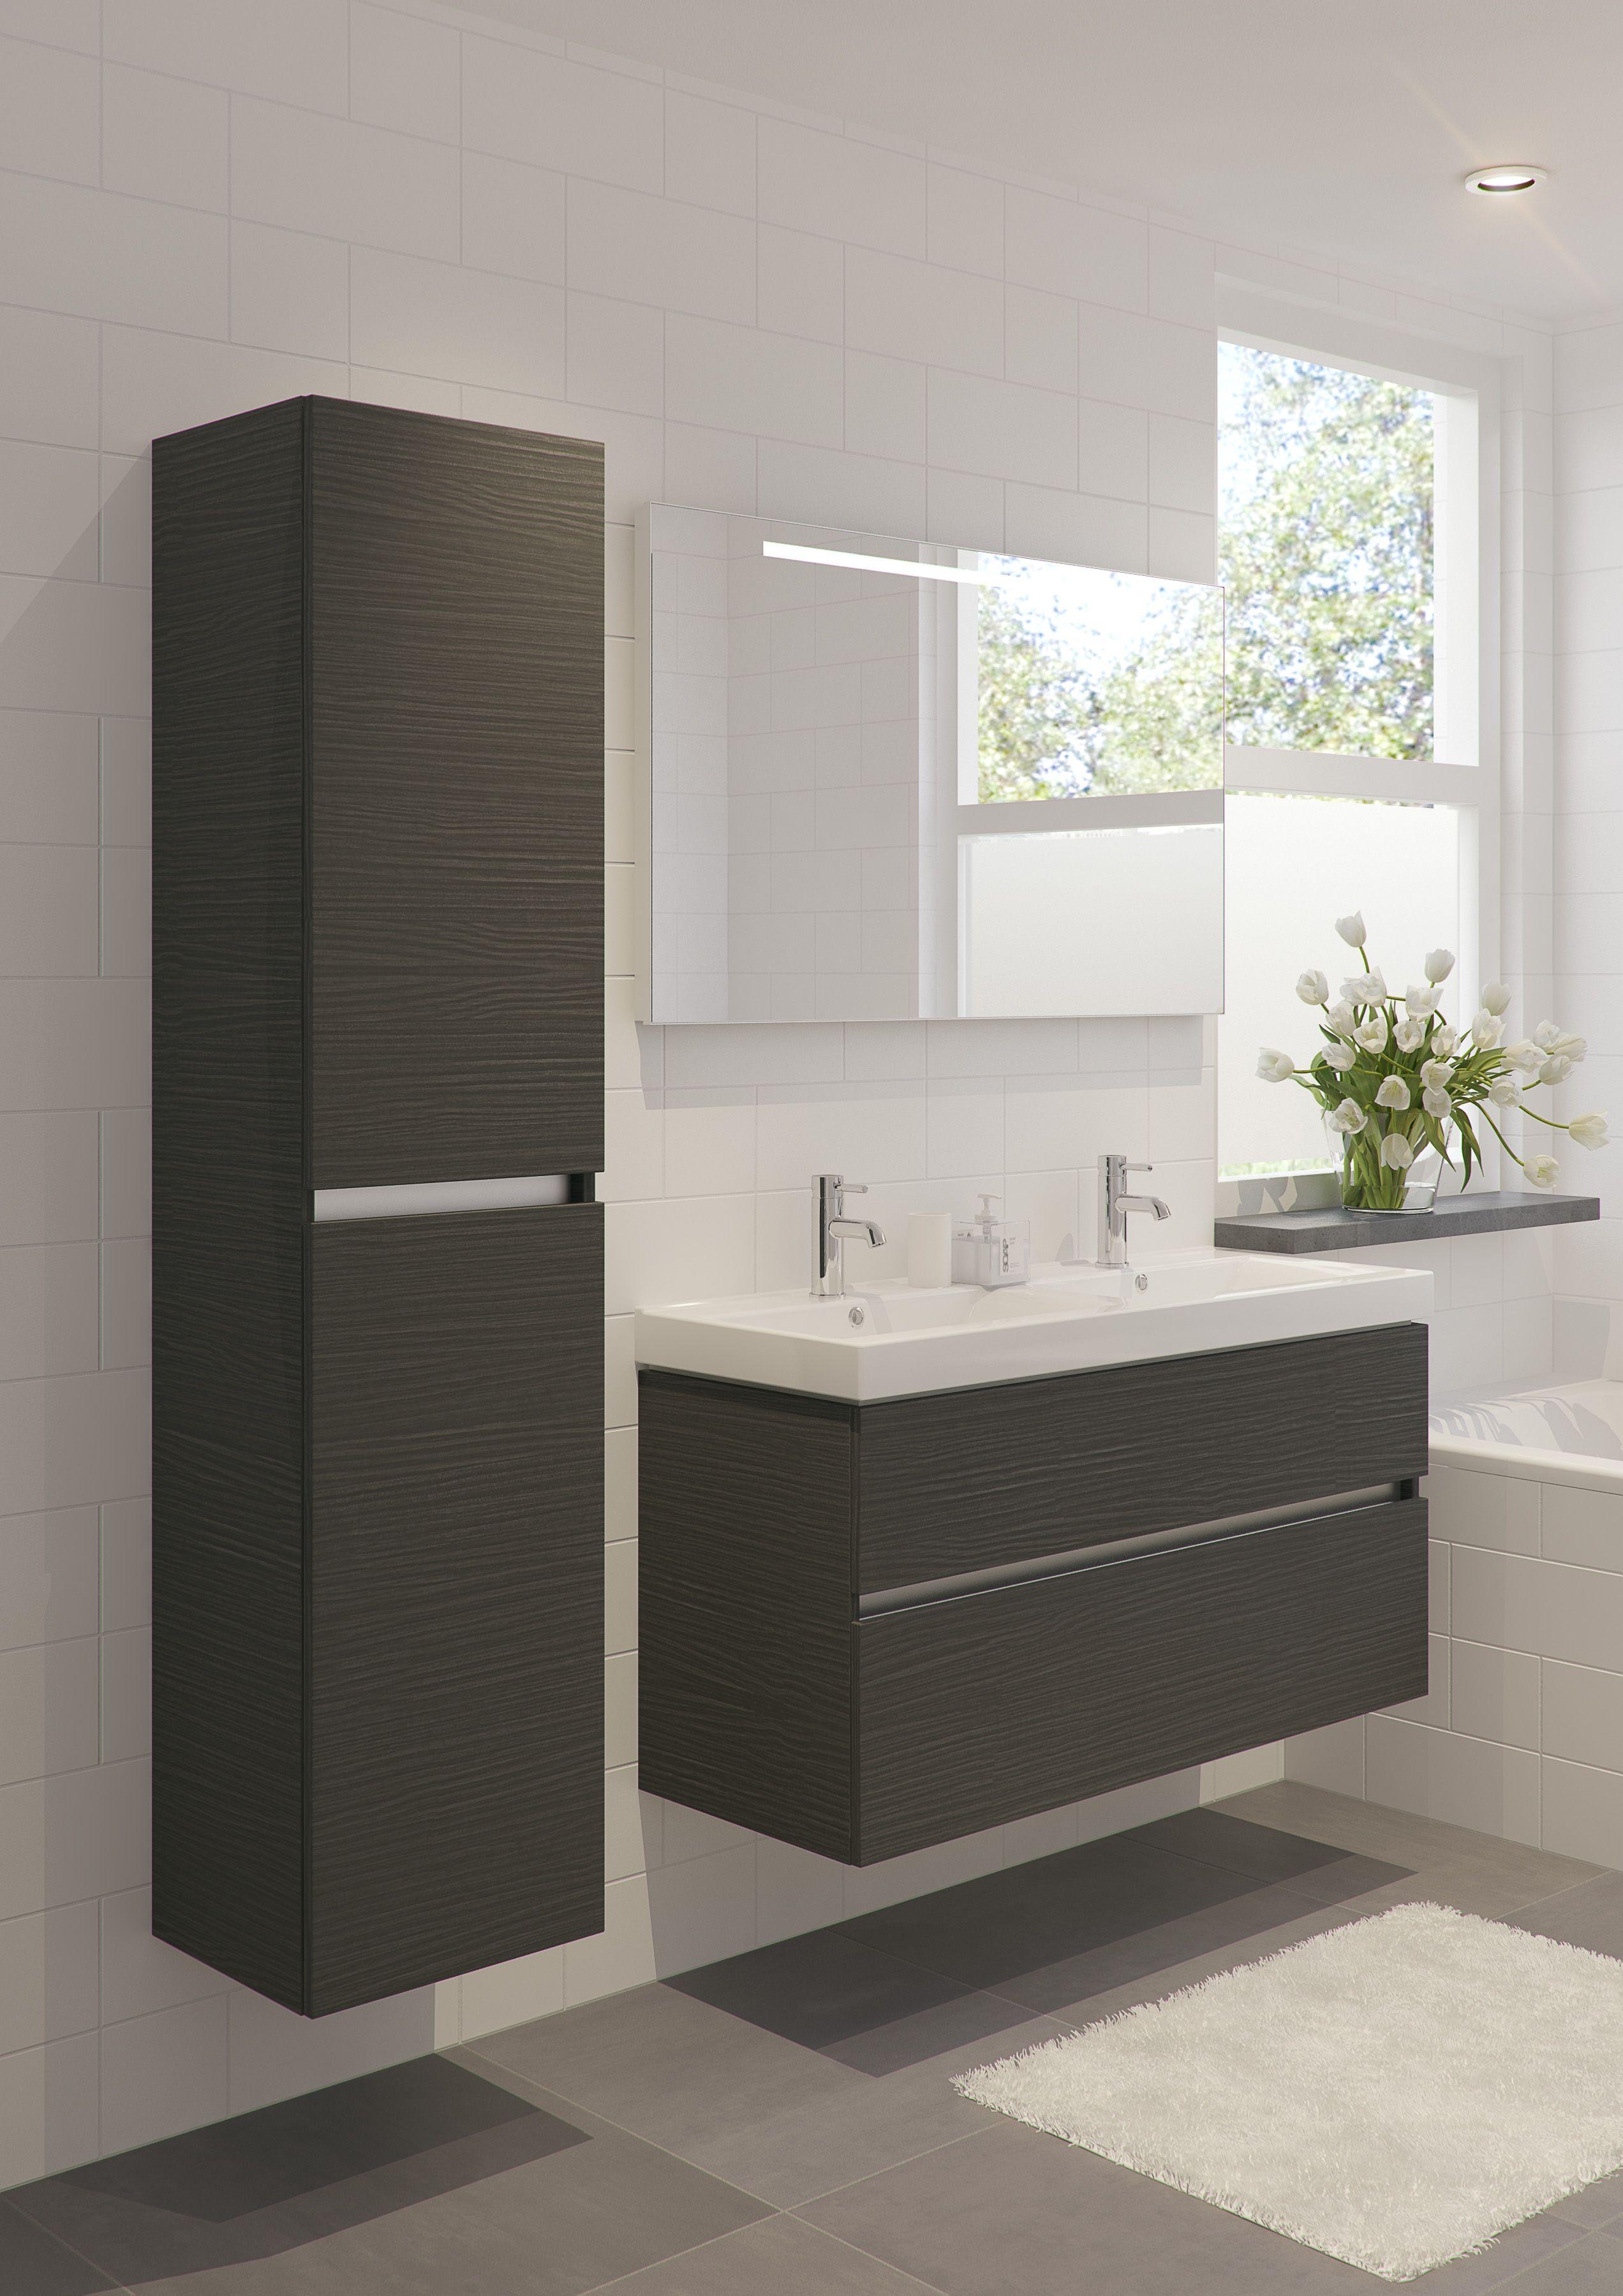 Bruynzeel Nano 120 Cm Hacienda Badmeubel Badkamer Sanitair Bathroom Furniture Cabinet Meuble Salle De Bain Bathroom Furniture Modern